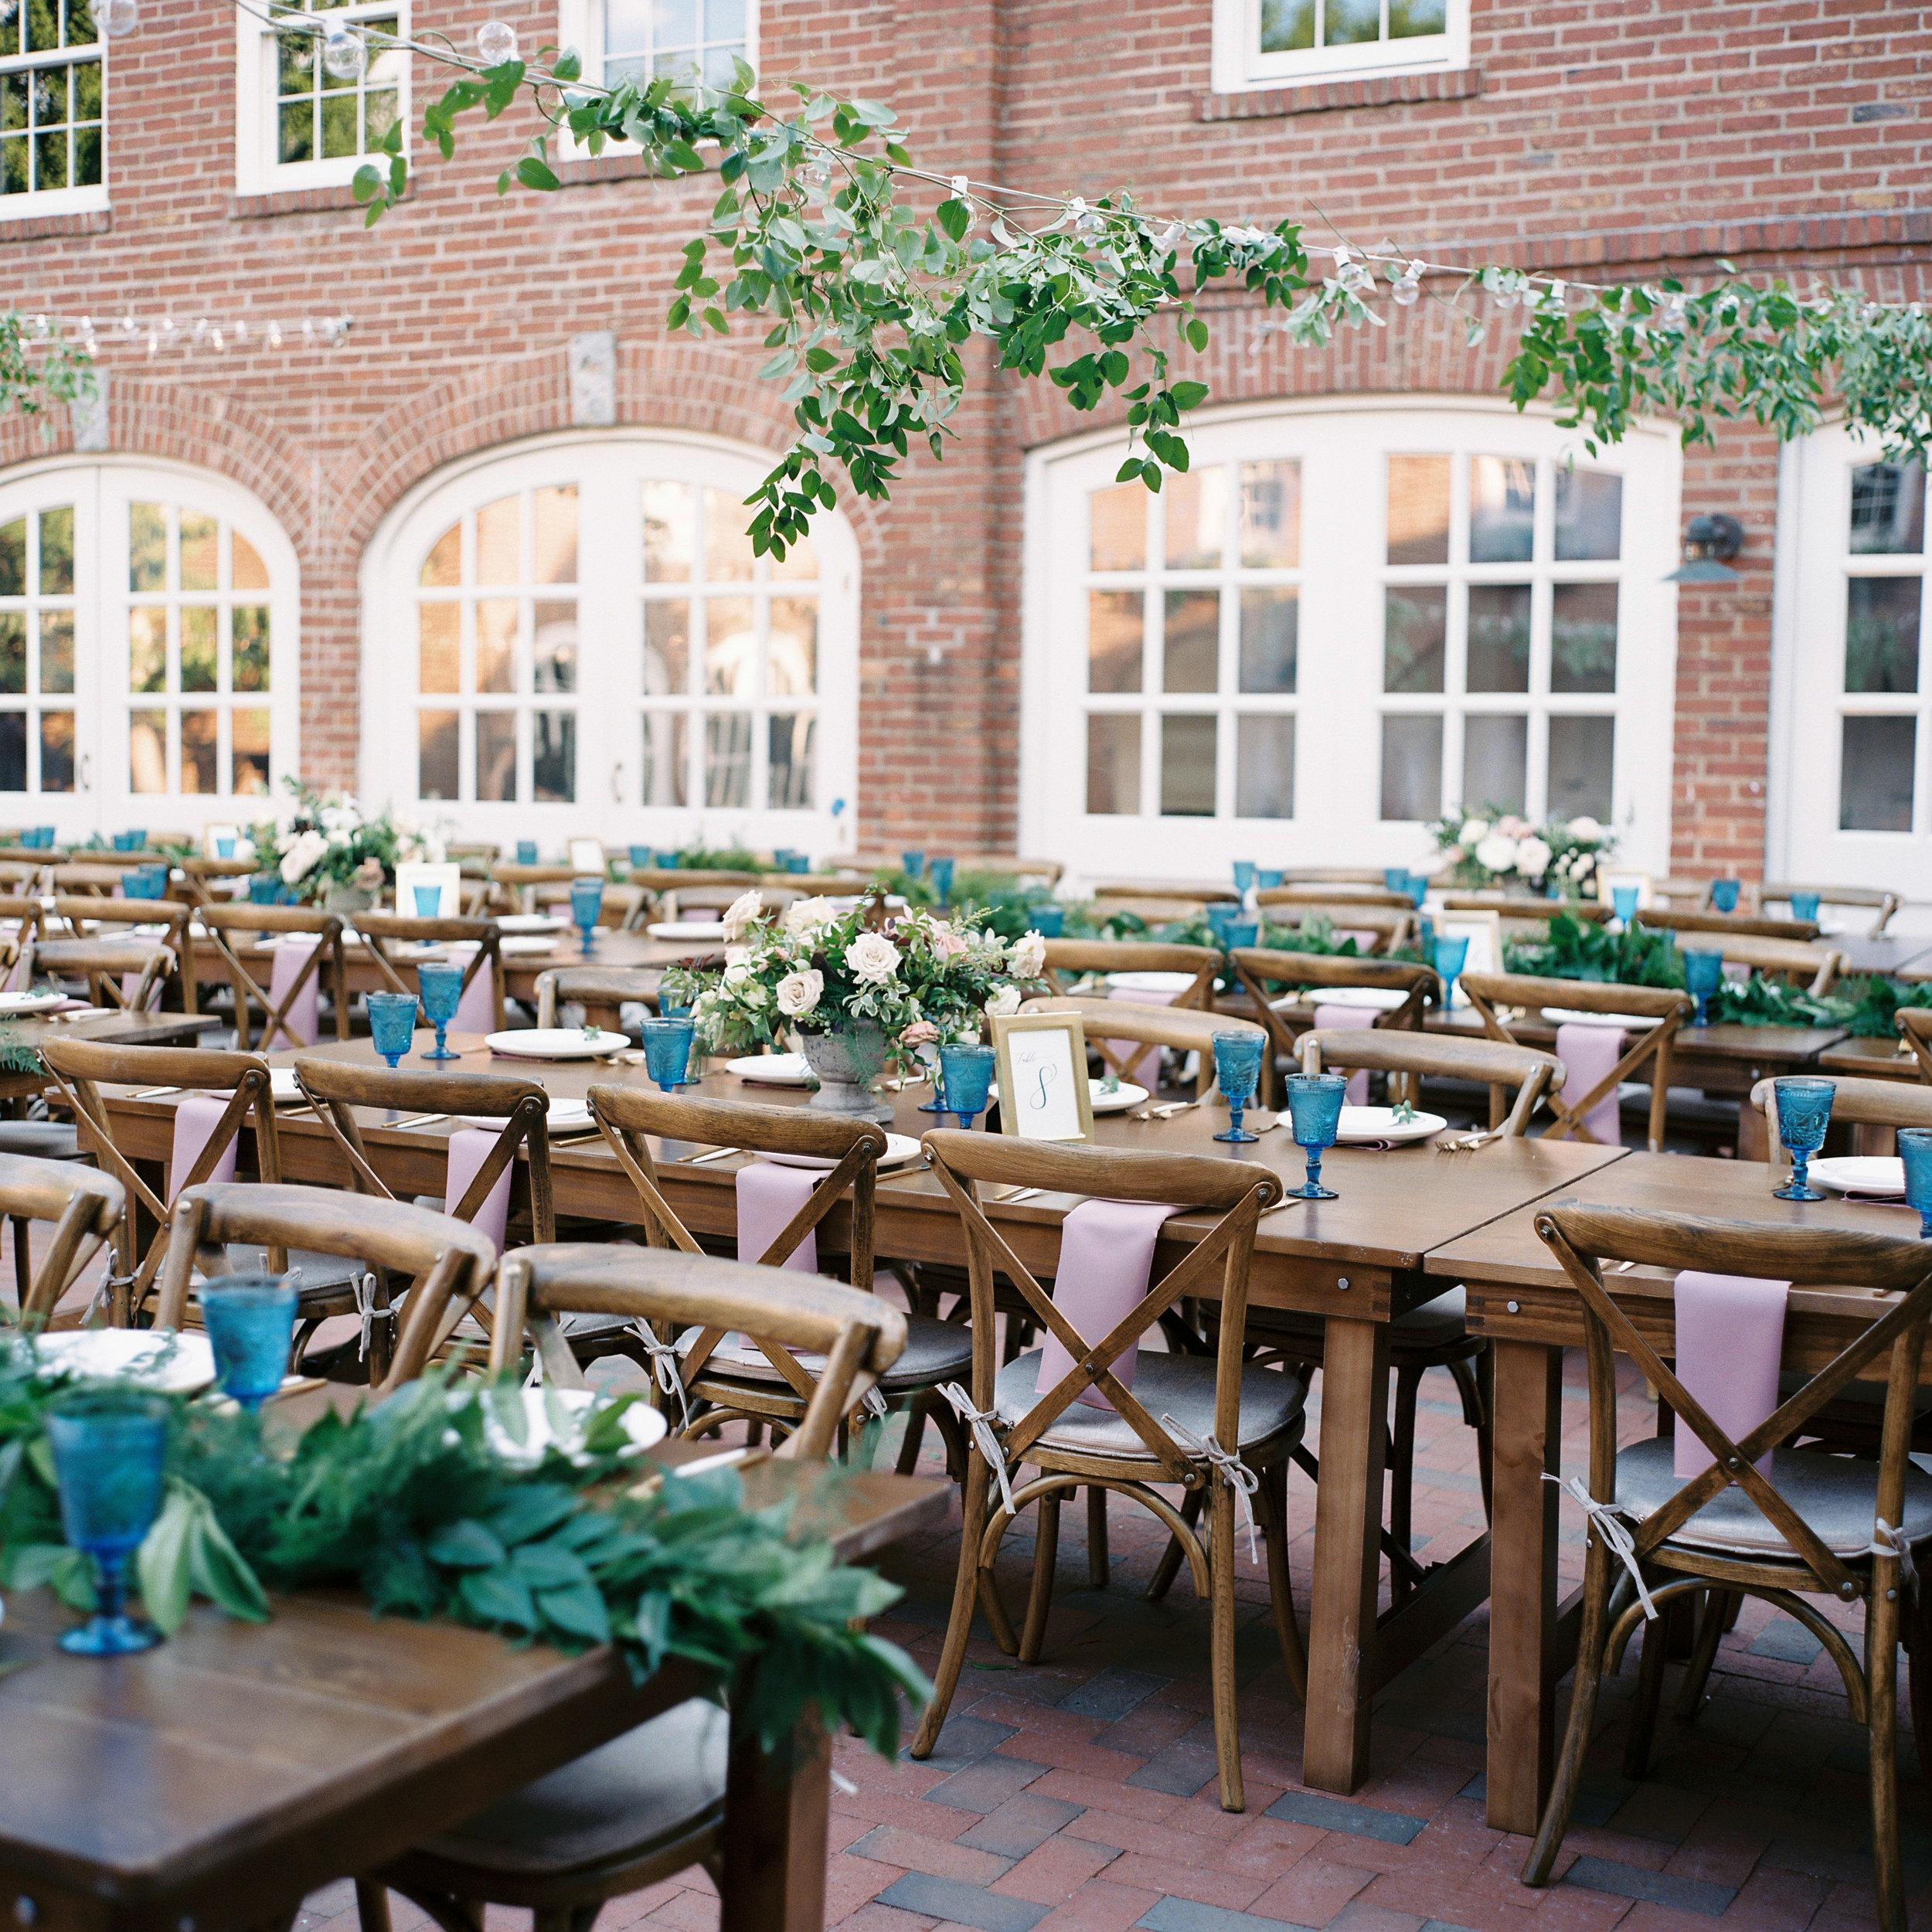 Cheekwood Courtyard Wedding with string lights with vine-like greenery // Nashville Wedding Floral Designer